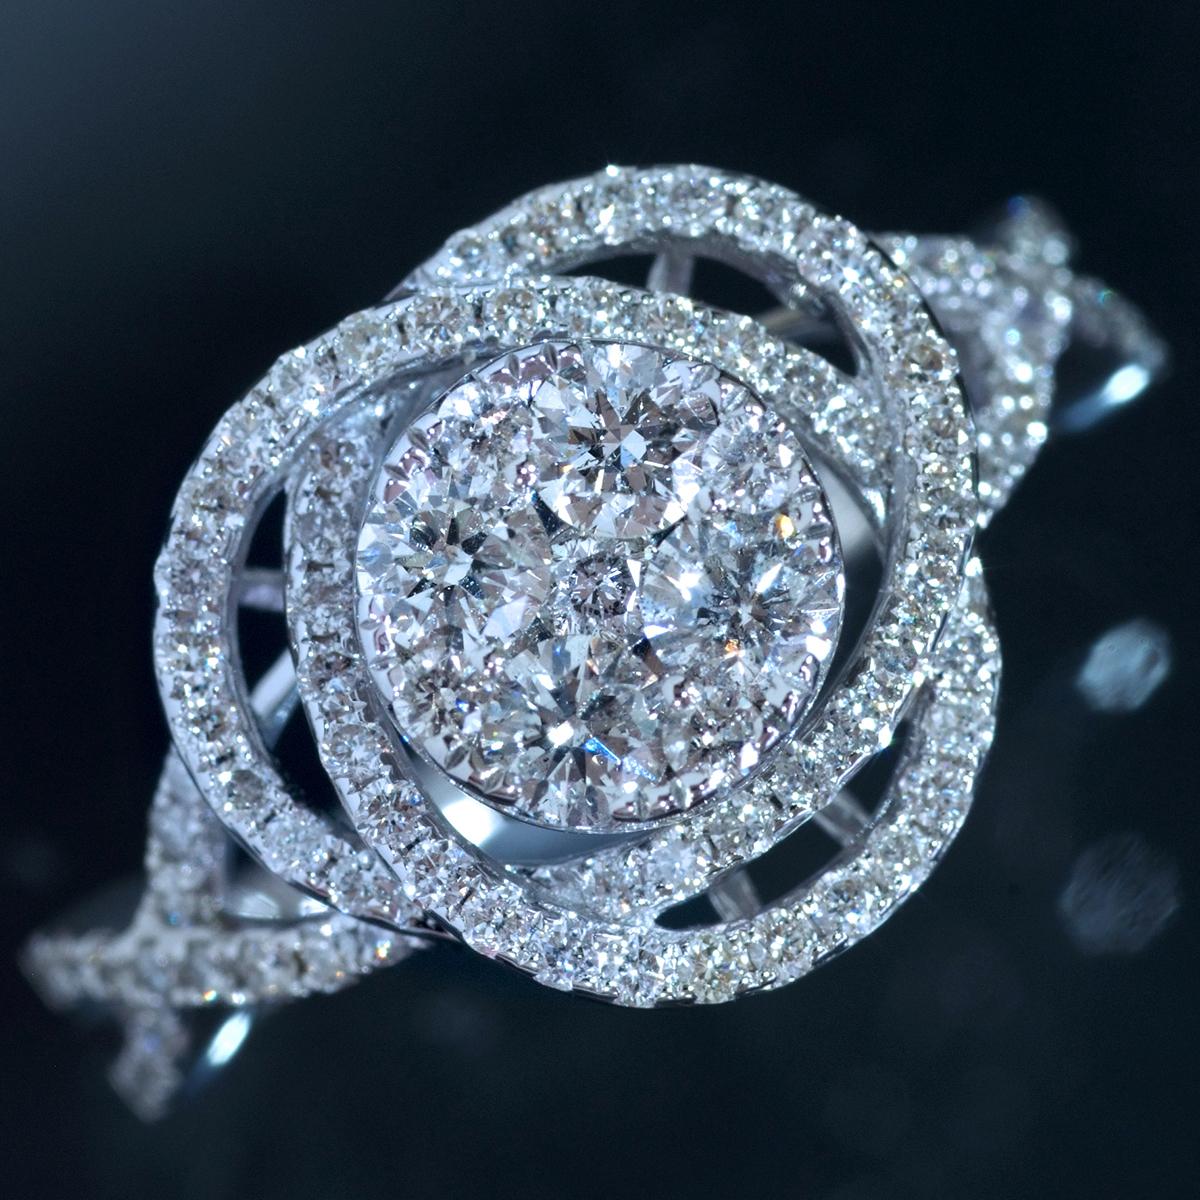 *R4377【Rose Blossom Diamond Ring】令和3年現行モデル!婚約指輪にも!天然上質ダイヤモンド0.90ct 最高級18金WG無垢リング 新品